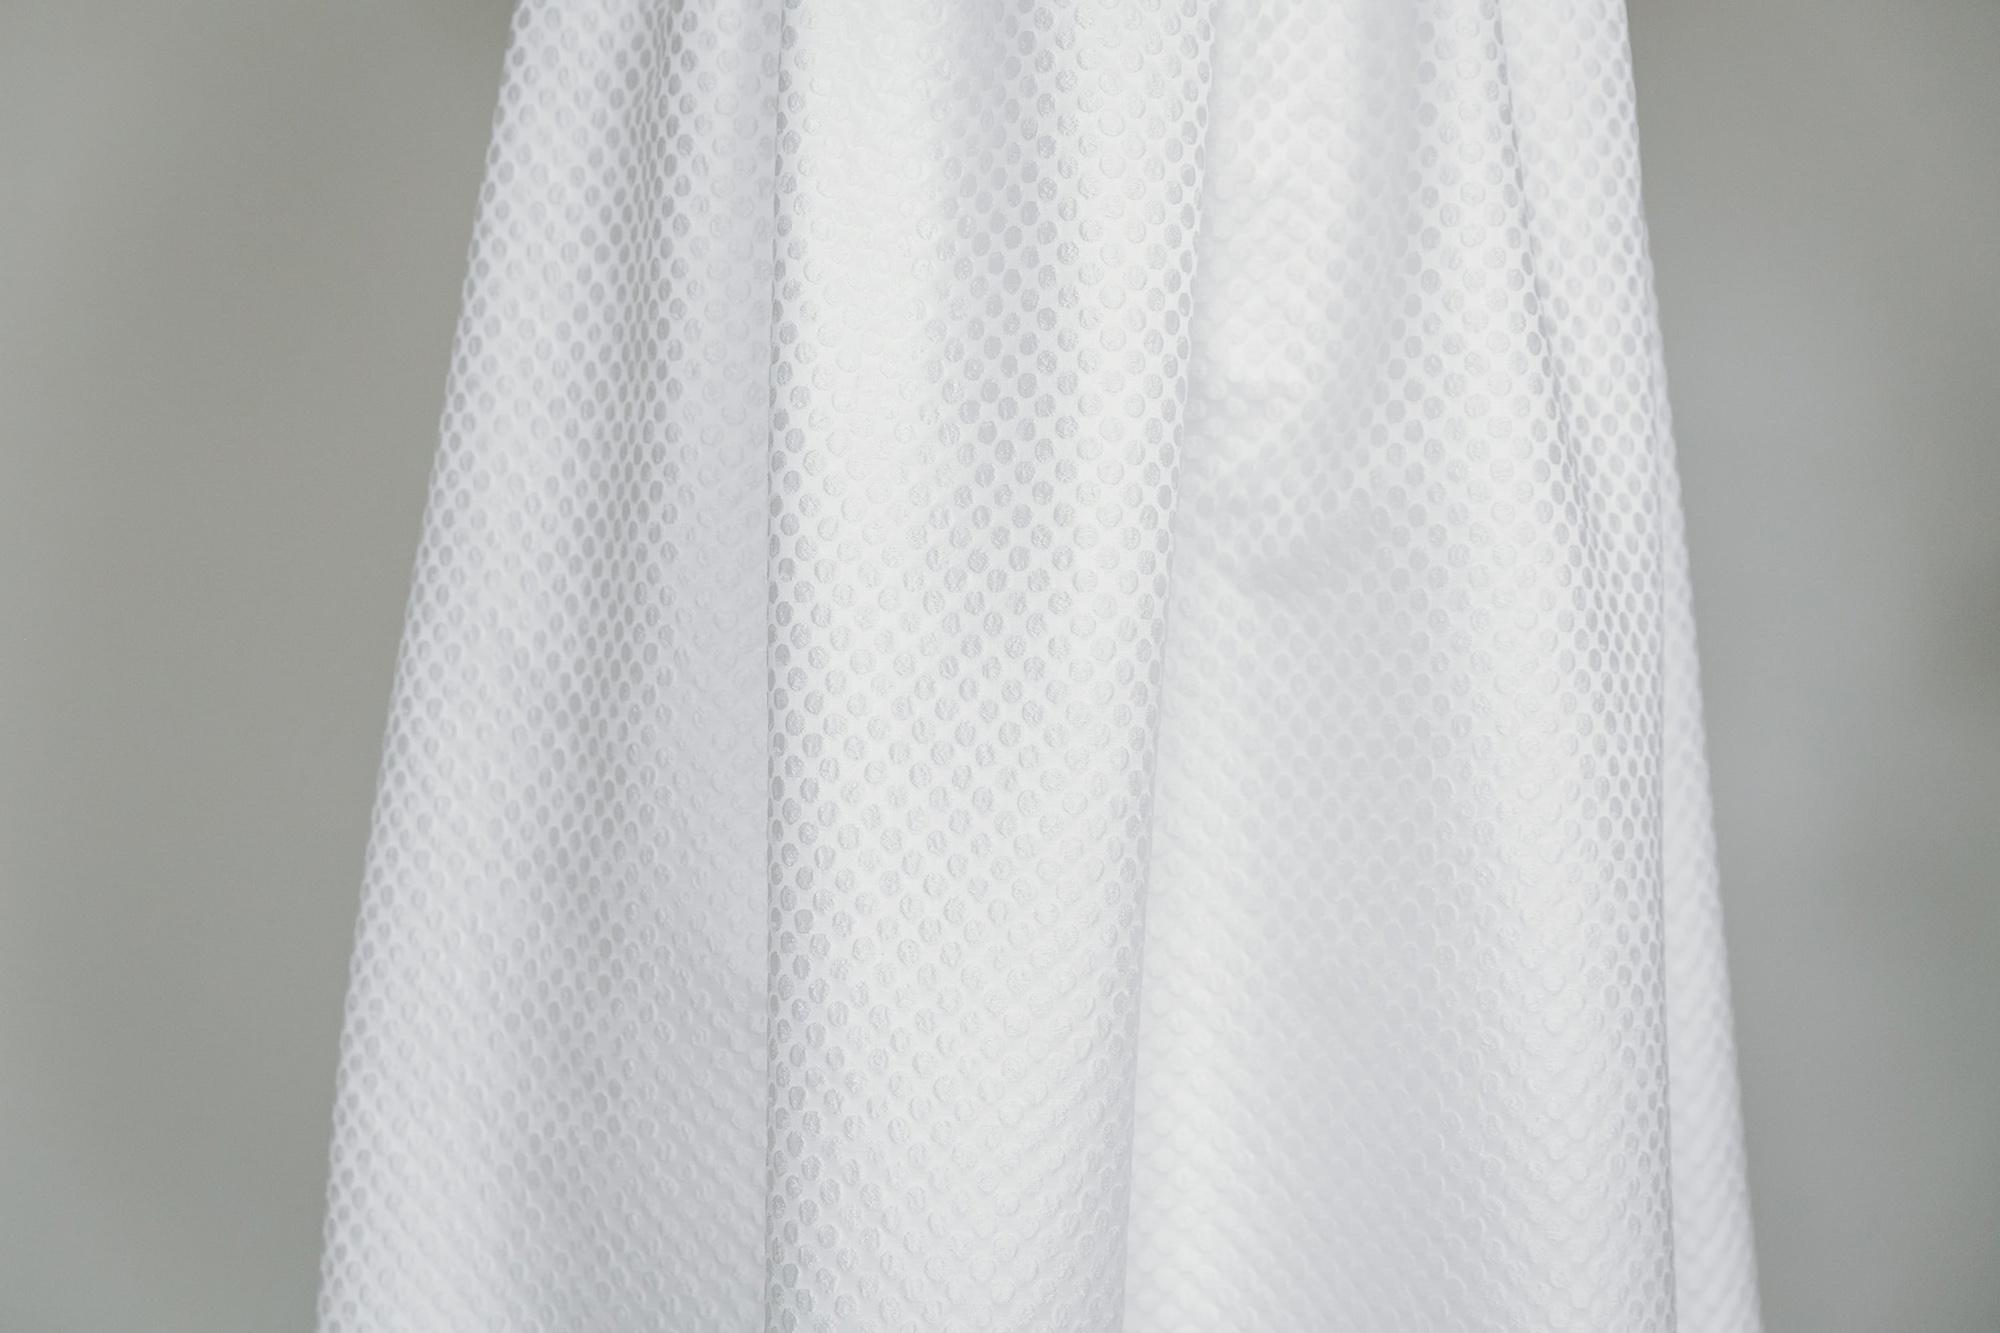 Kate-Beaumont-Sheffield-Zinnia-Modern-Wedding-Gown-Polka-Dot-Pleated-Skirt-19.jpg